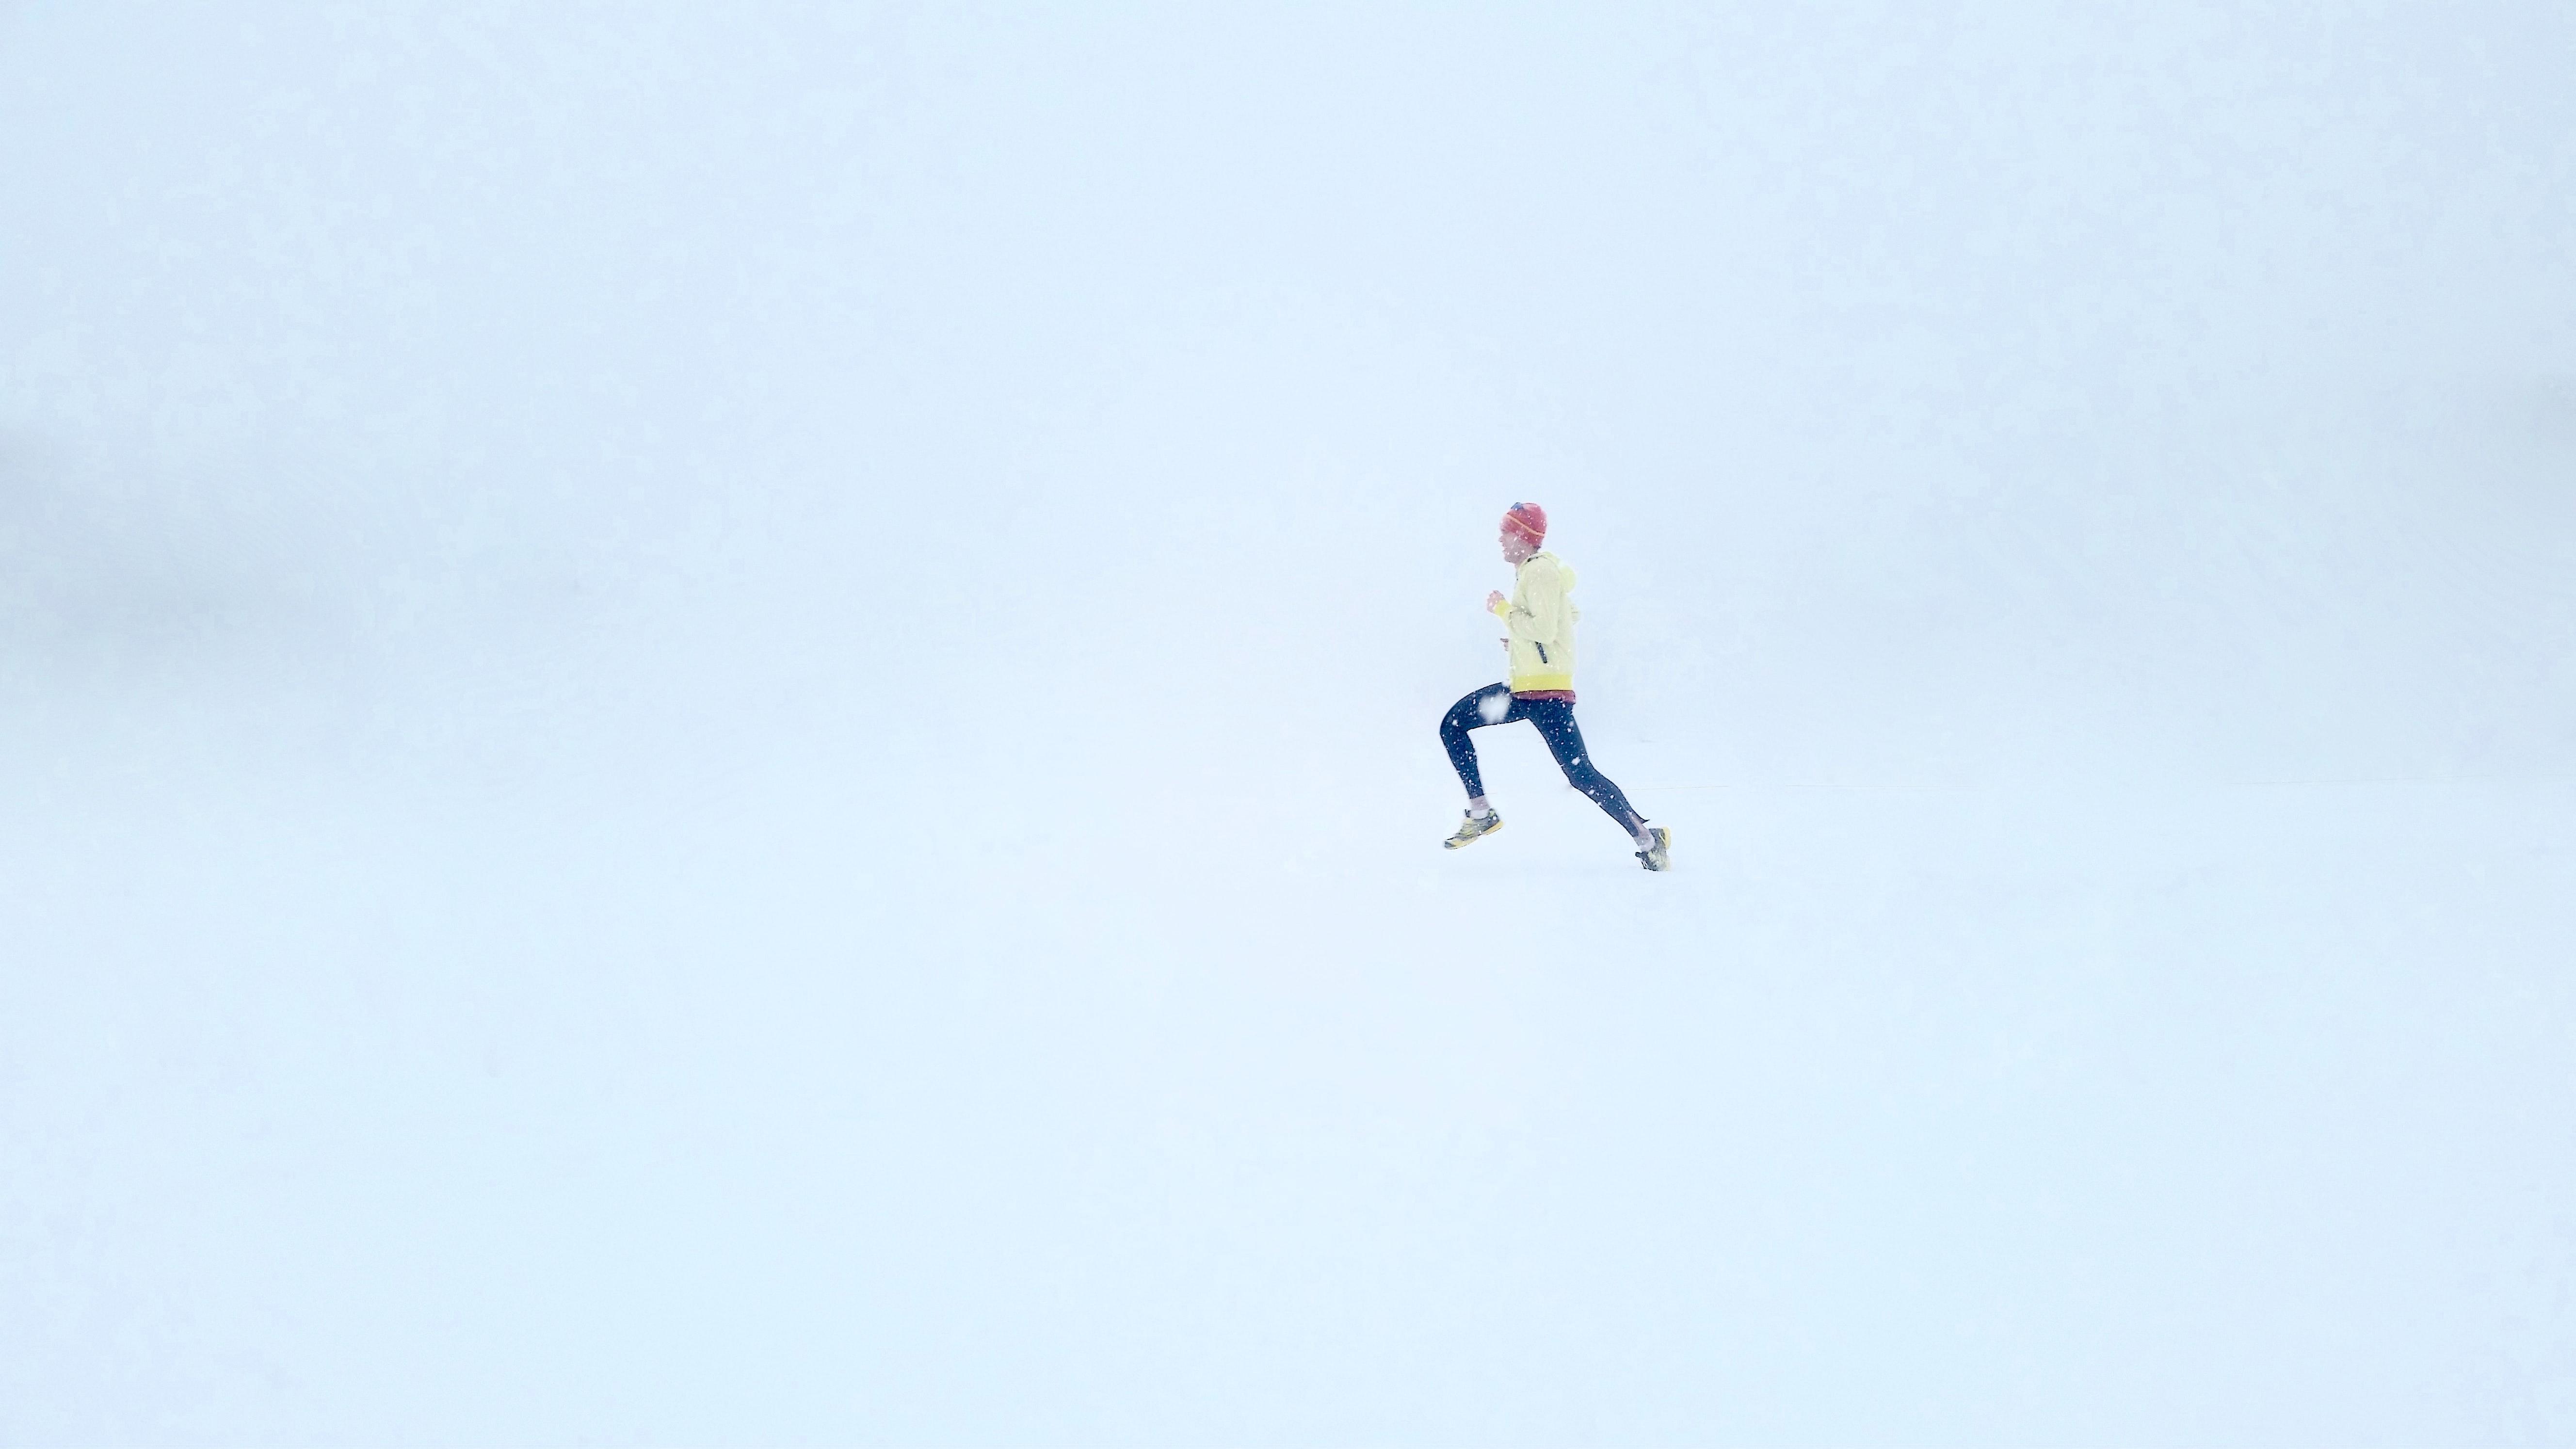 Hardlopen in de winter